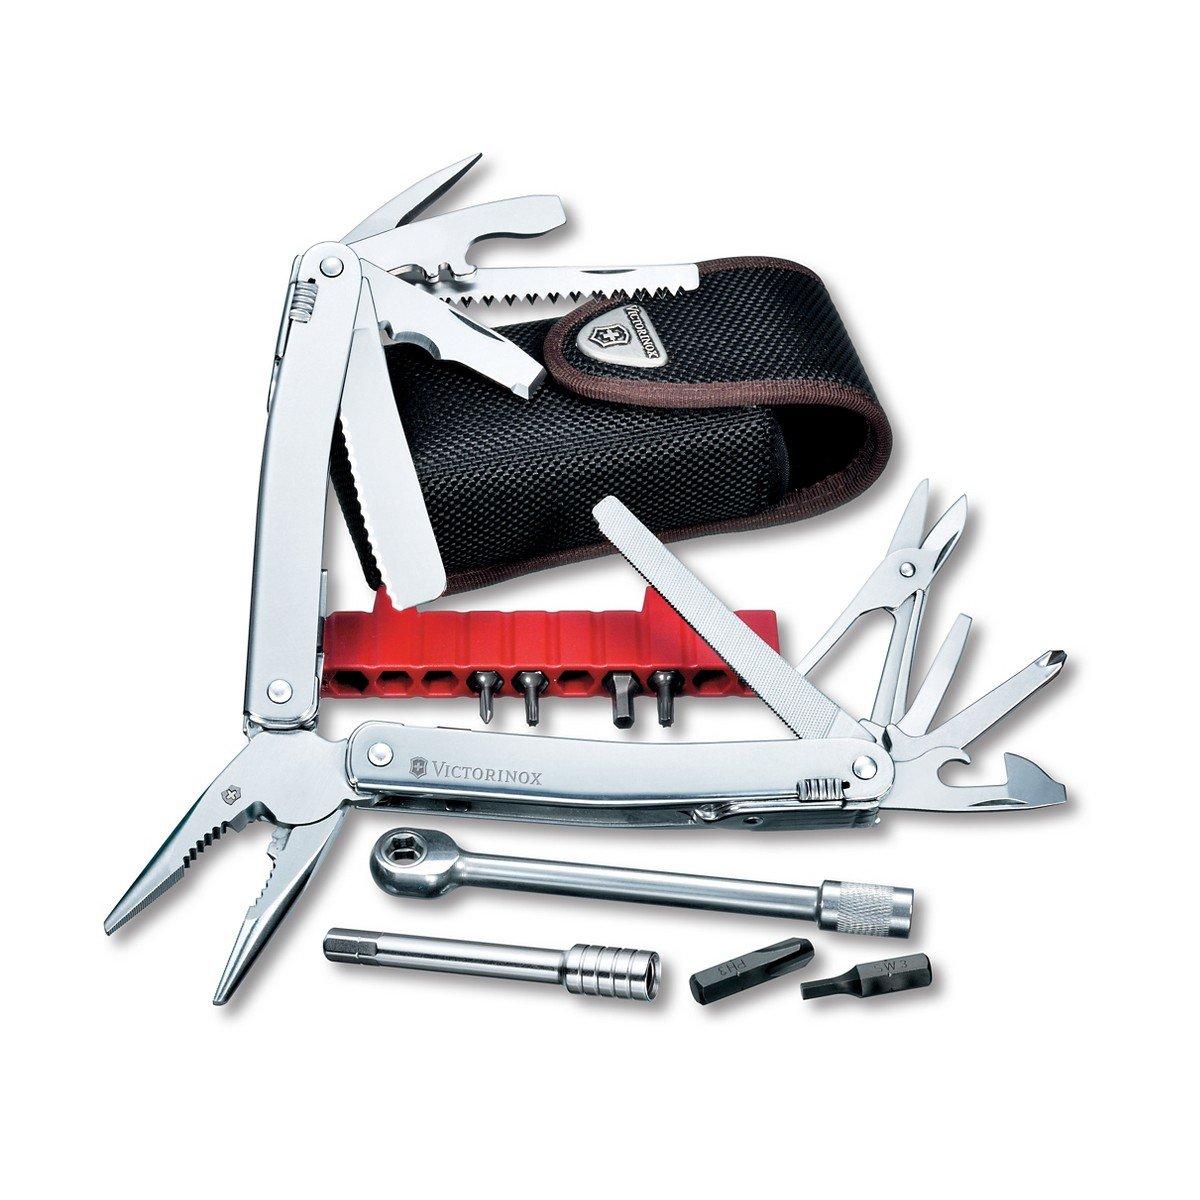 Victorinox Swiss Army SwissTool Spirit Plus Ratchet Multi-Tool, Includes Nylon Pouch by Victorinox (Image #1)